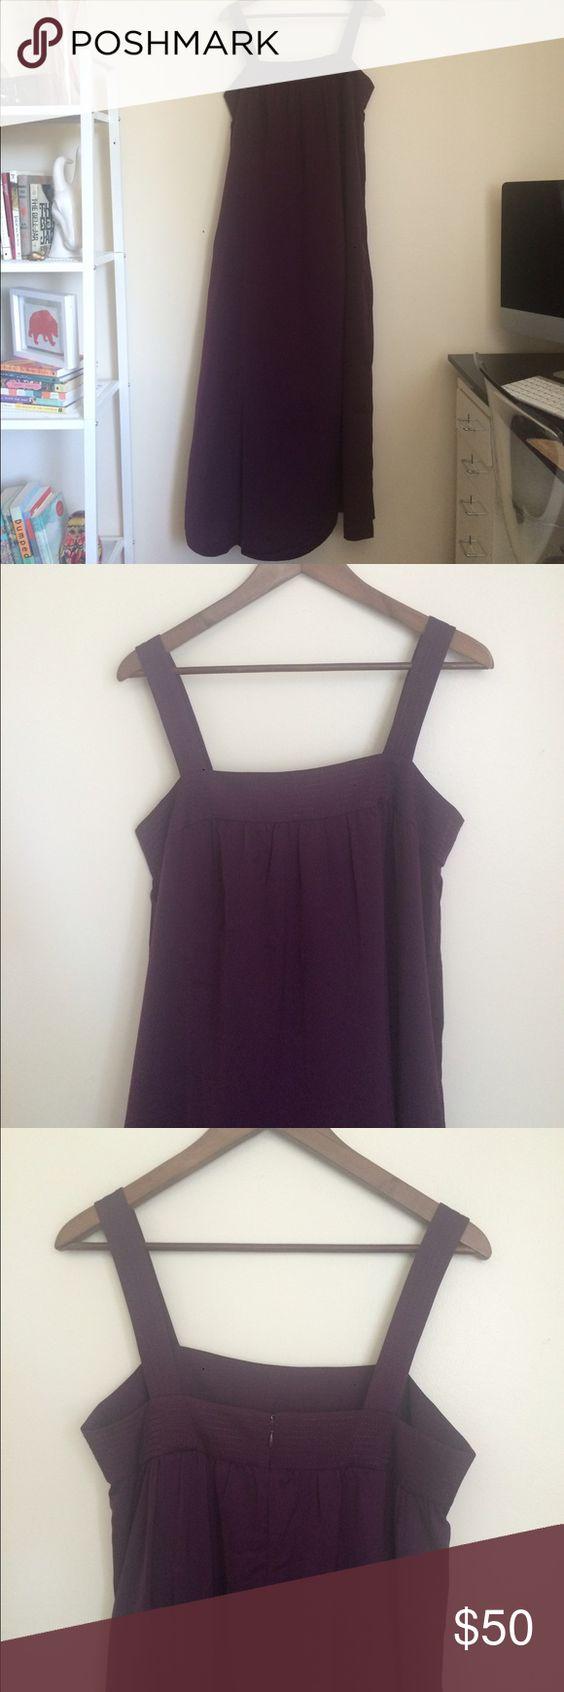 Eggplant purple maxi dress